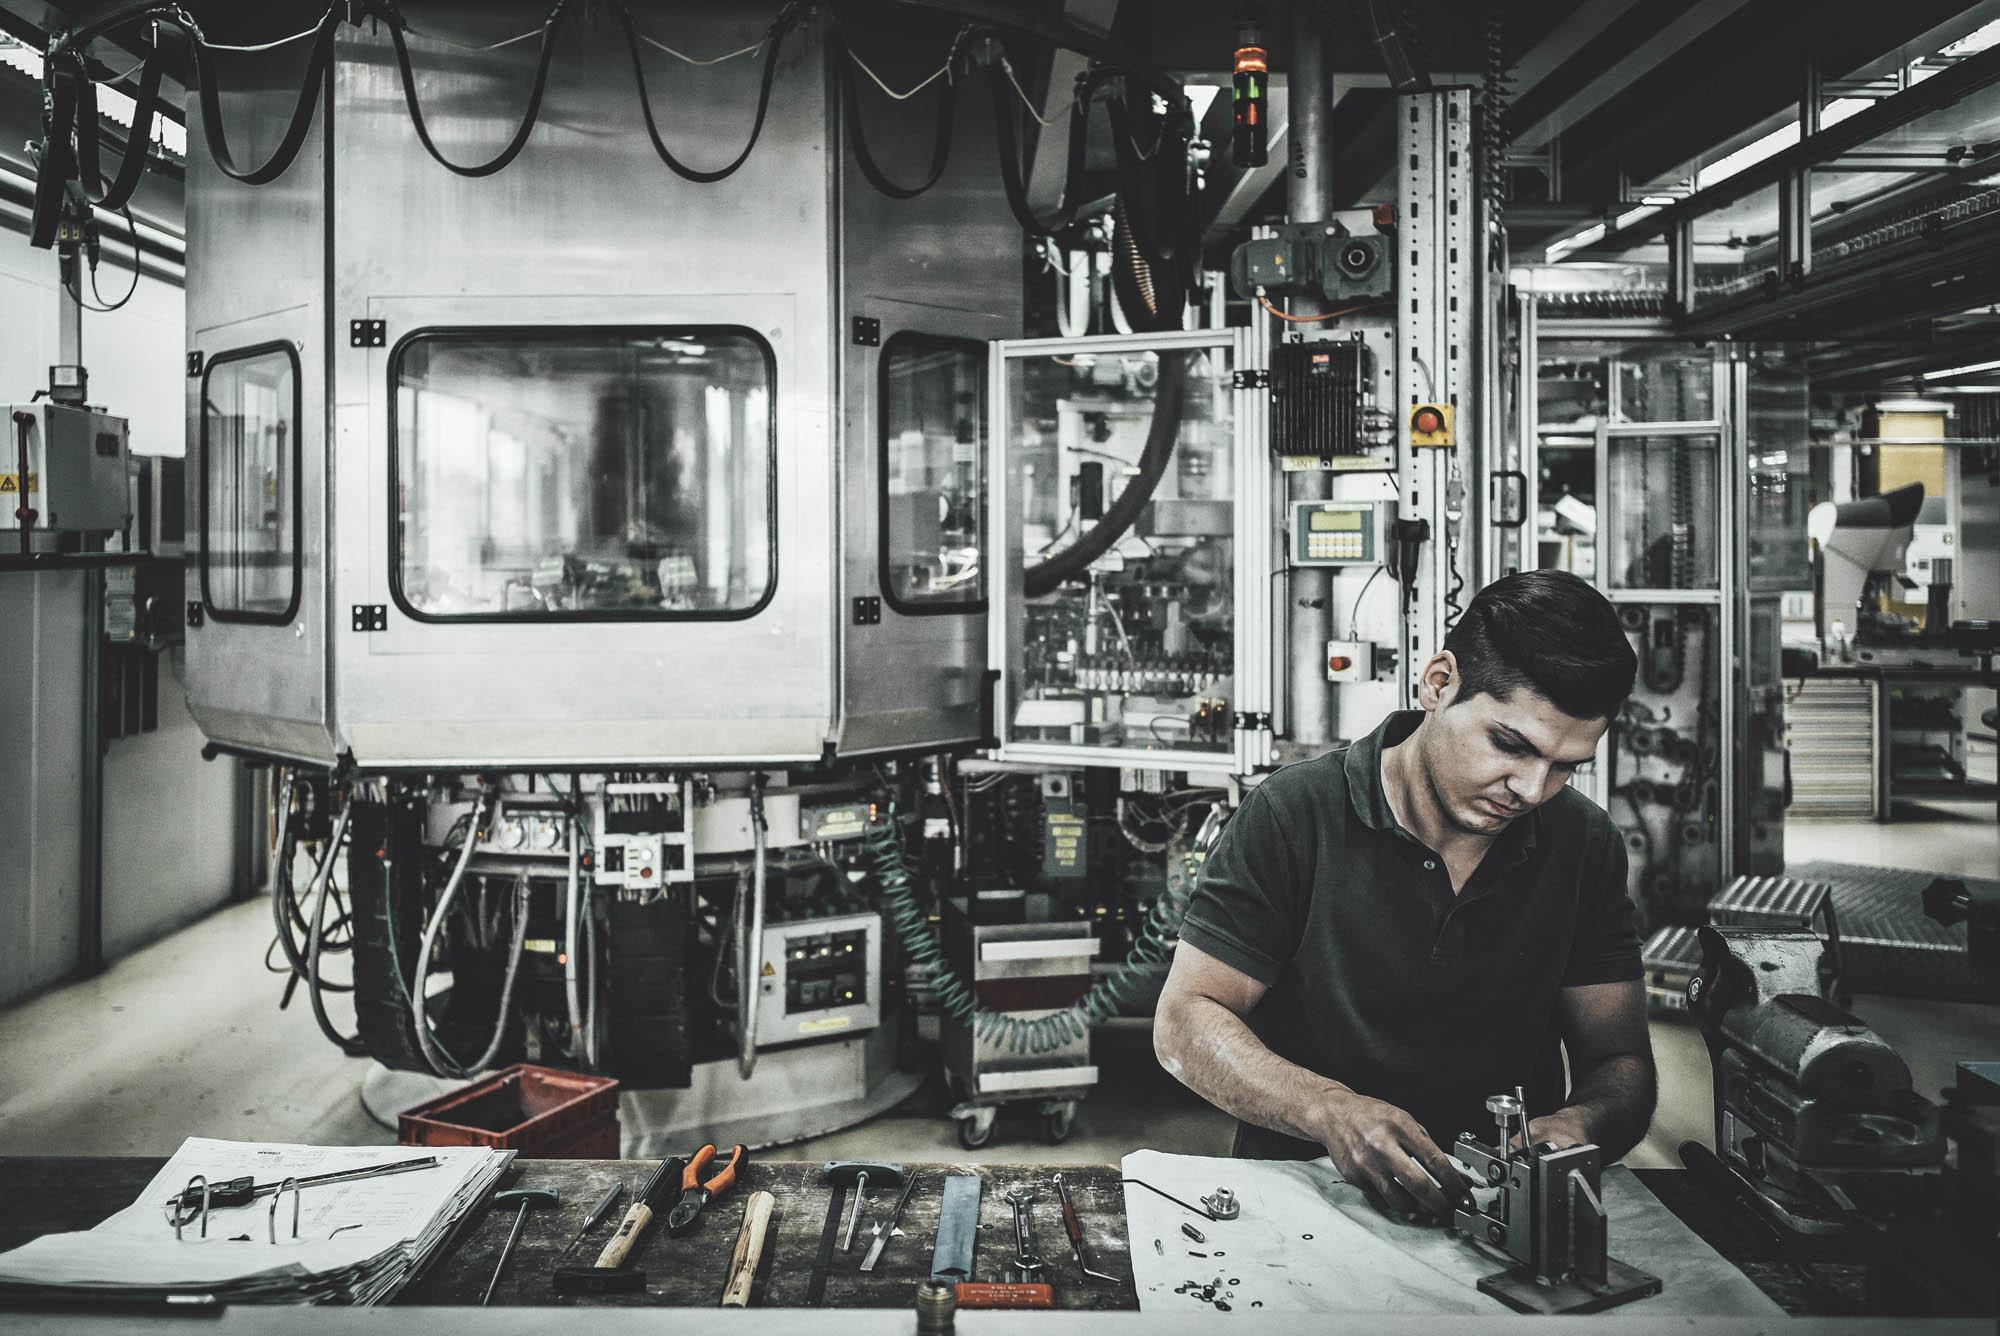 seifertuebler-corporate-osram-filamentbulb-24.jpg